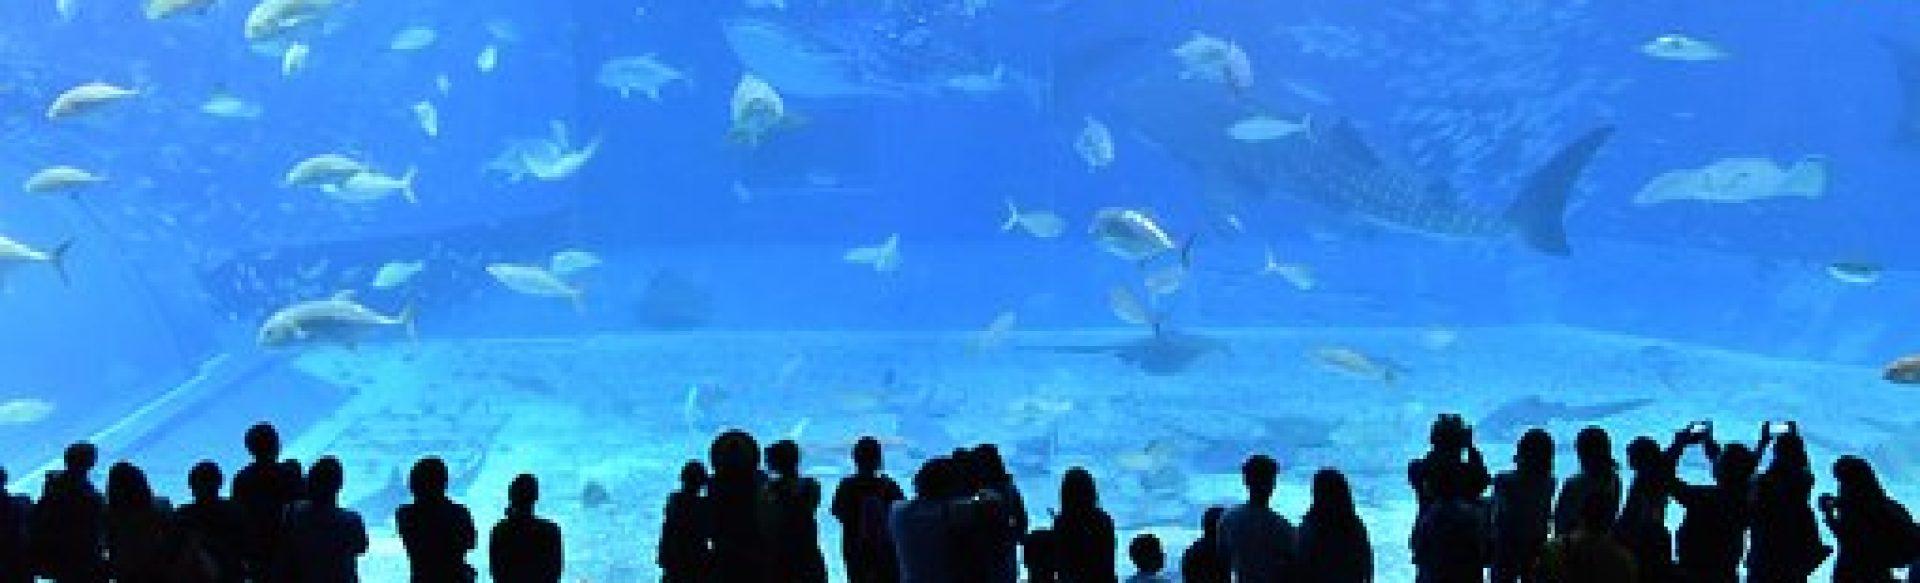 cropped-churaumi-aquarium-2407812__340.jpg